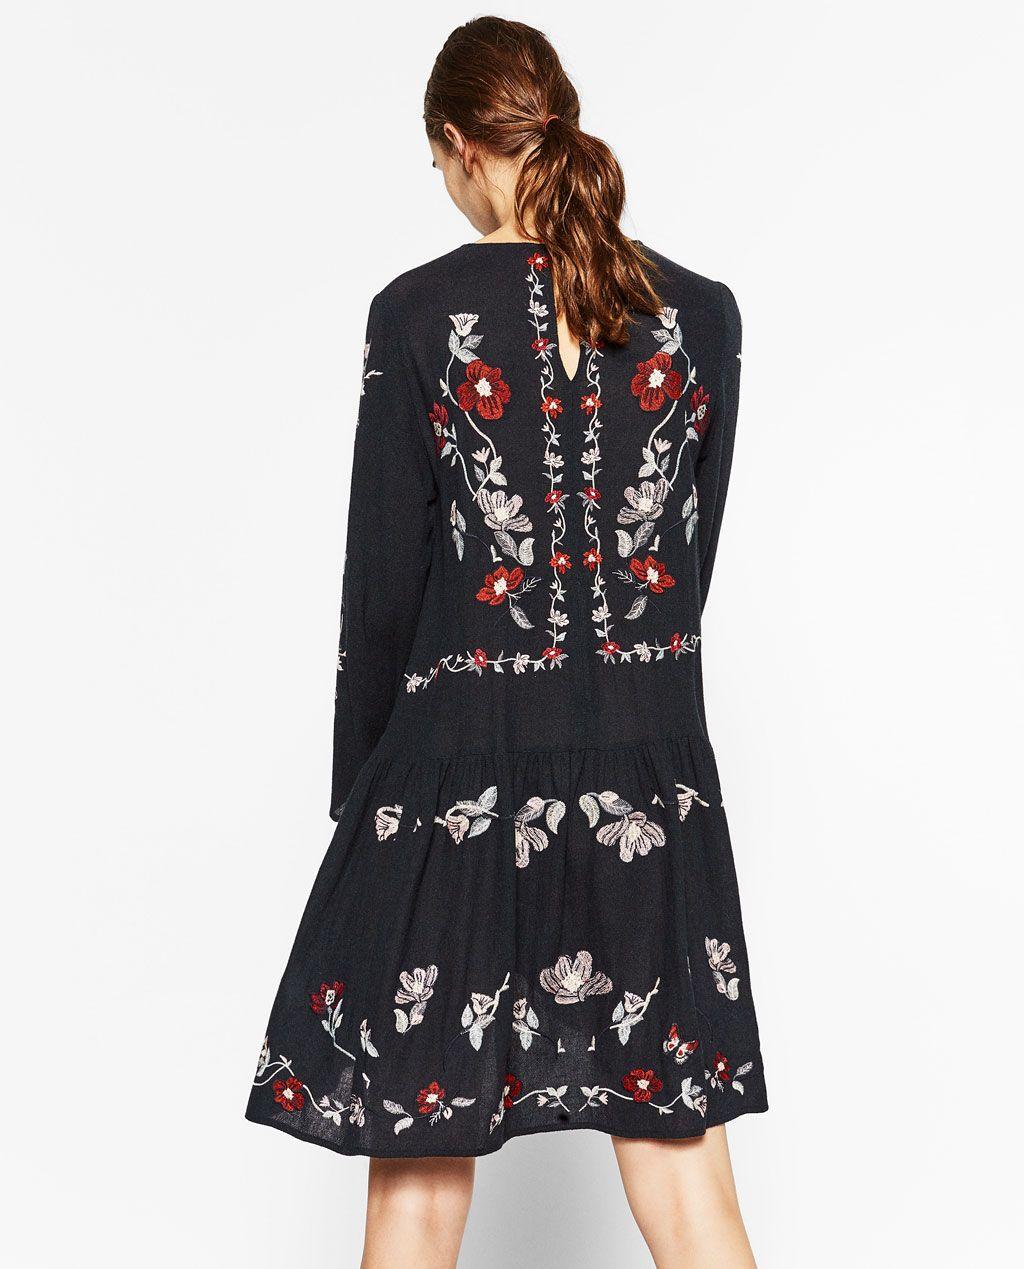 Imagen 4 De Vestido Bordado De Zara Embroidered Dress Unique Dresses Engagement Party Dresses